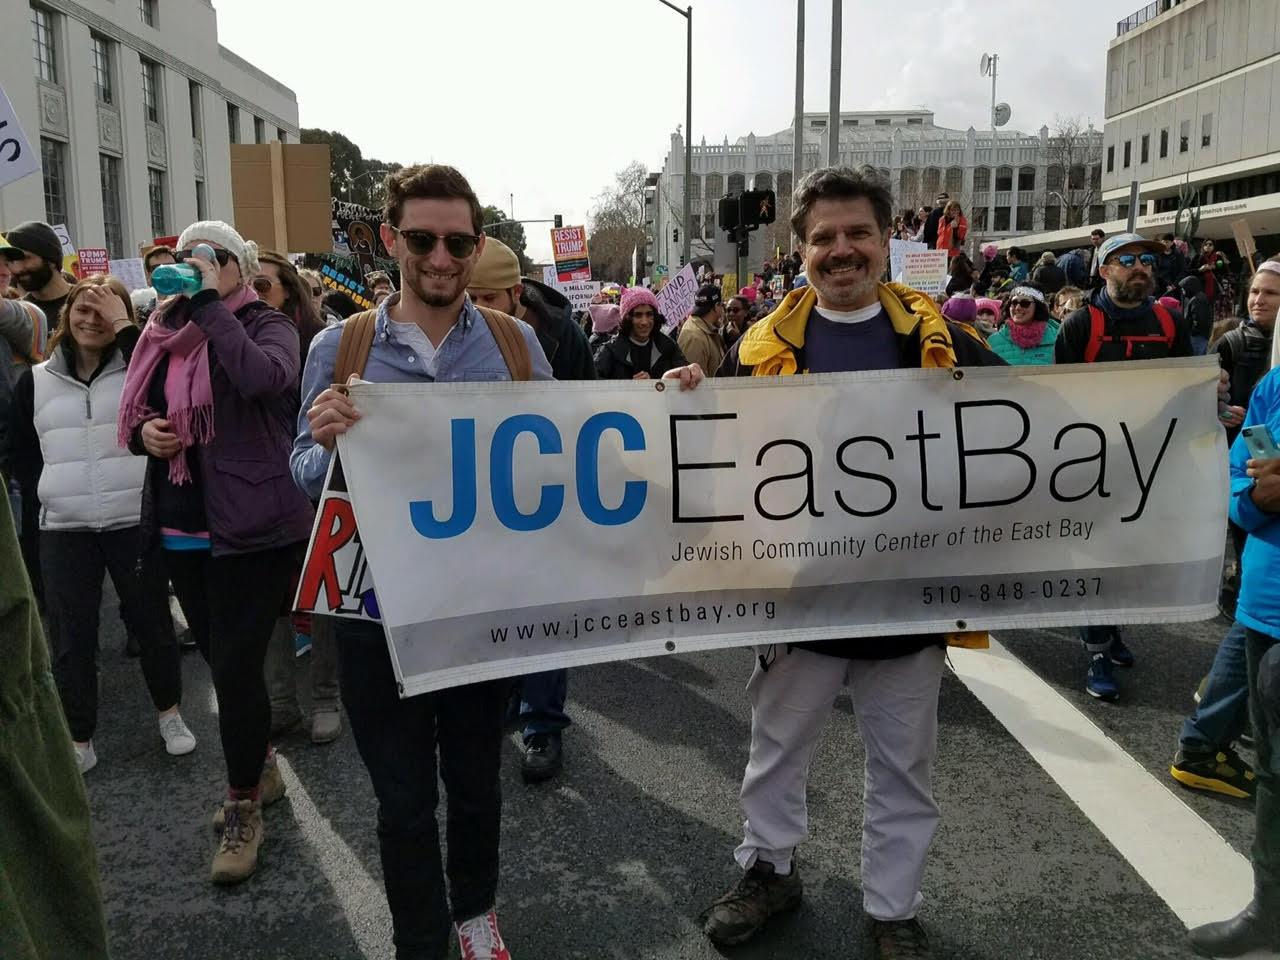 Two men holding a JCC East Bay banner